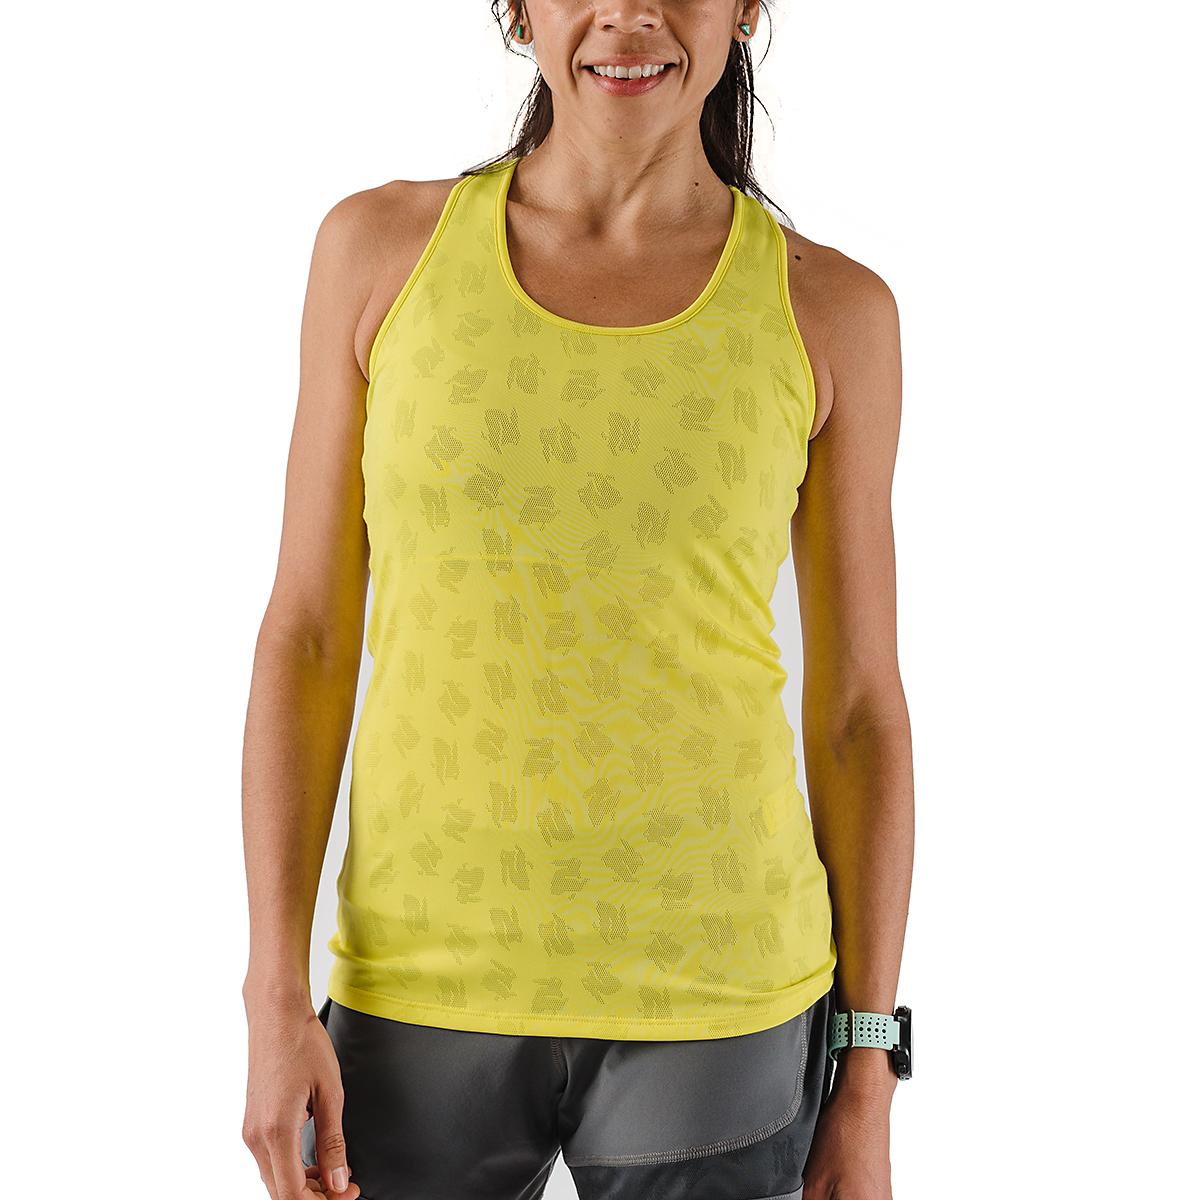 Women's Rabbit Bunny Hop Support & Pocket Tank - Color: Lemon Tonic - Size: XS, Lemon Tonic, large, image 1